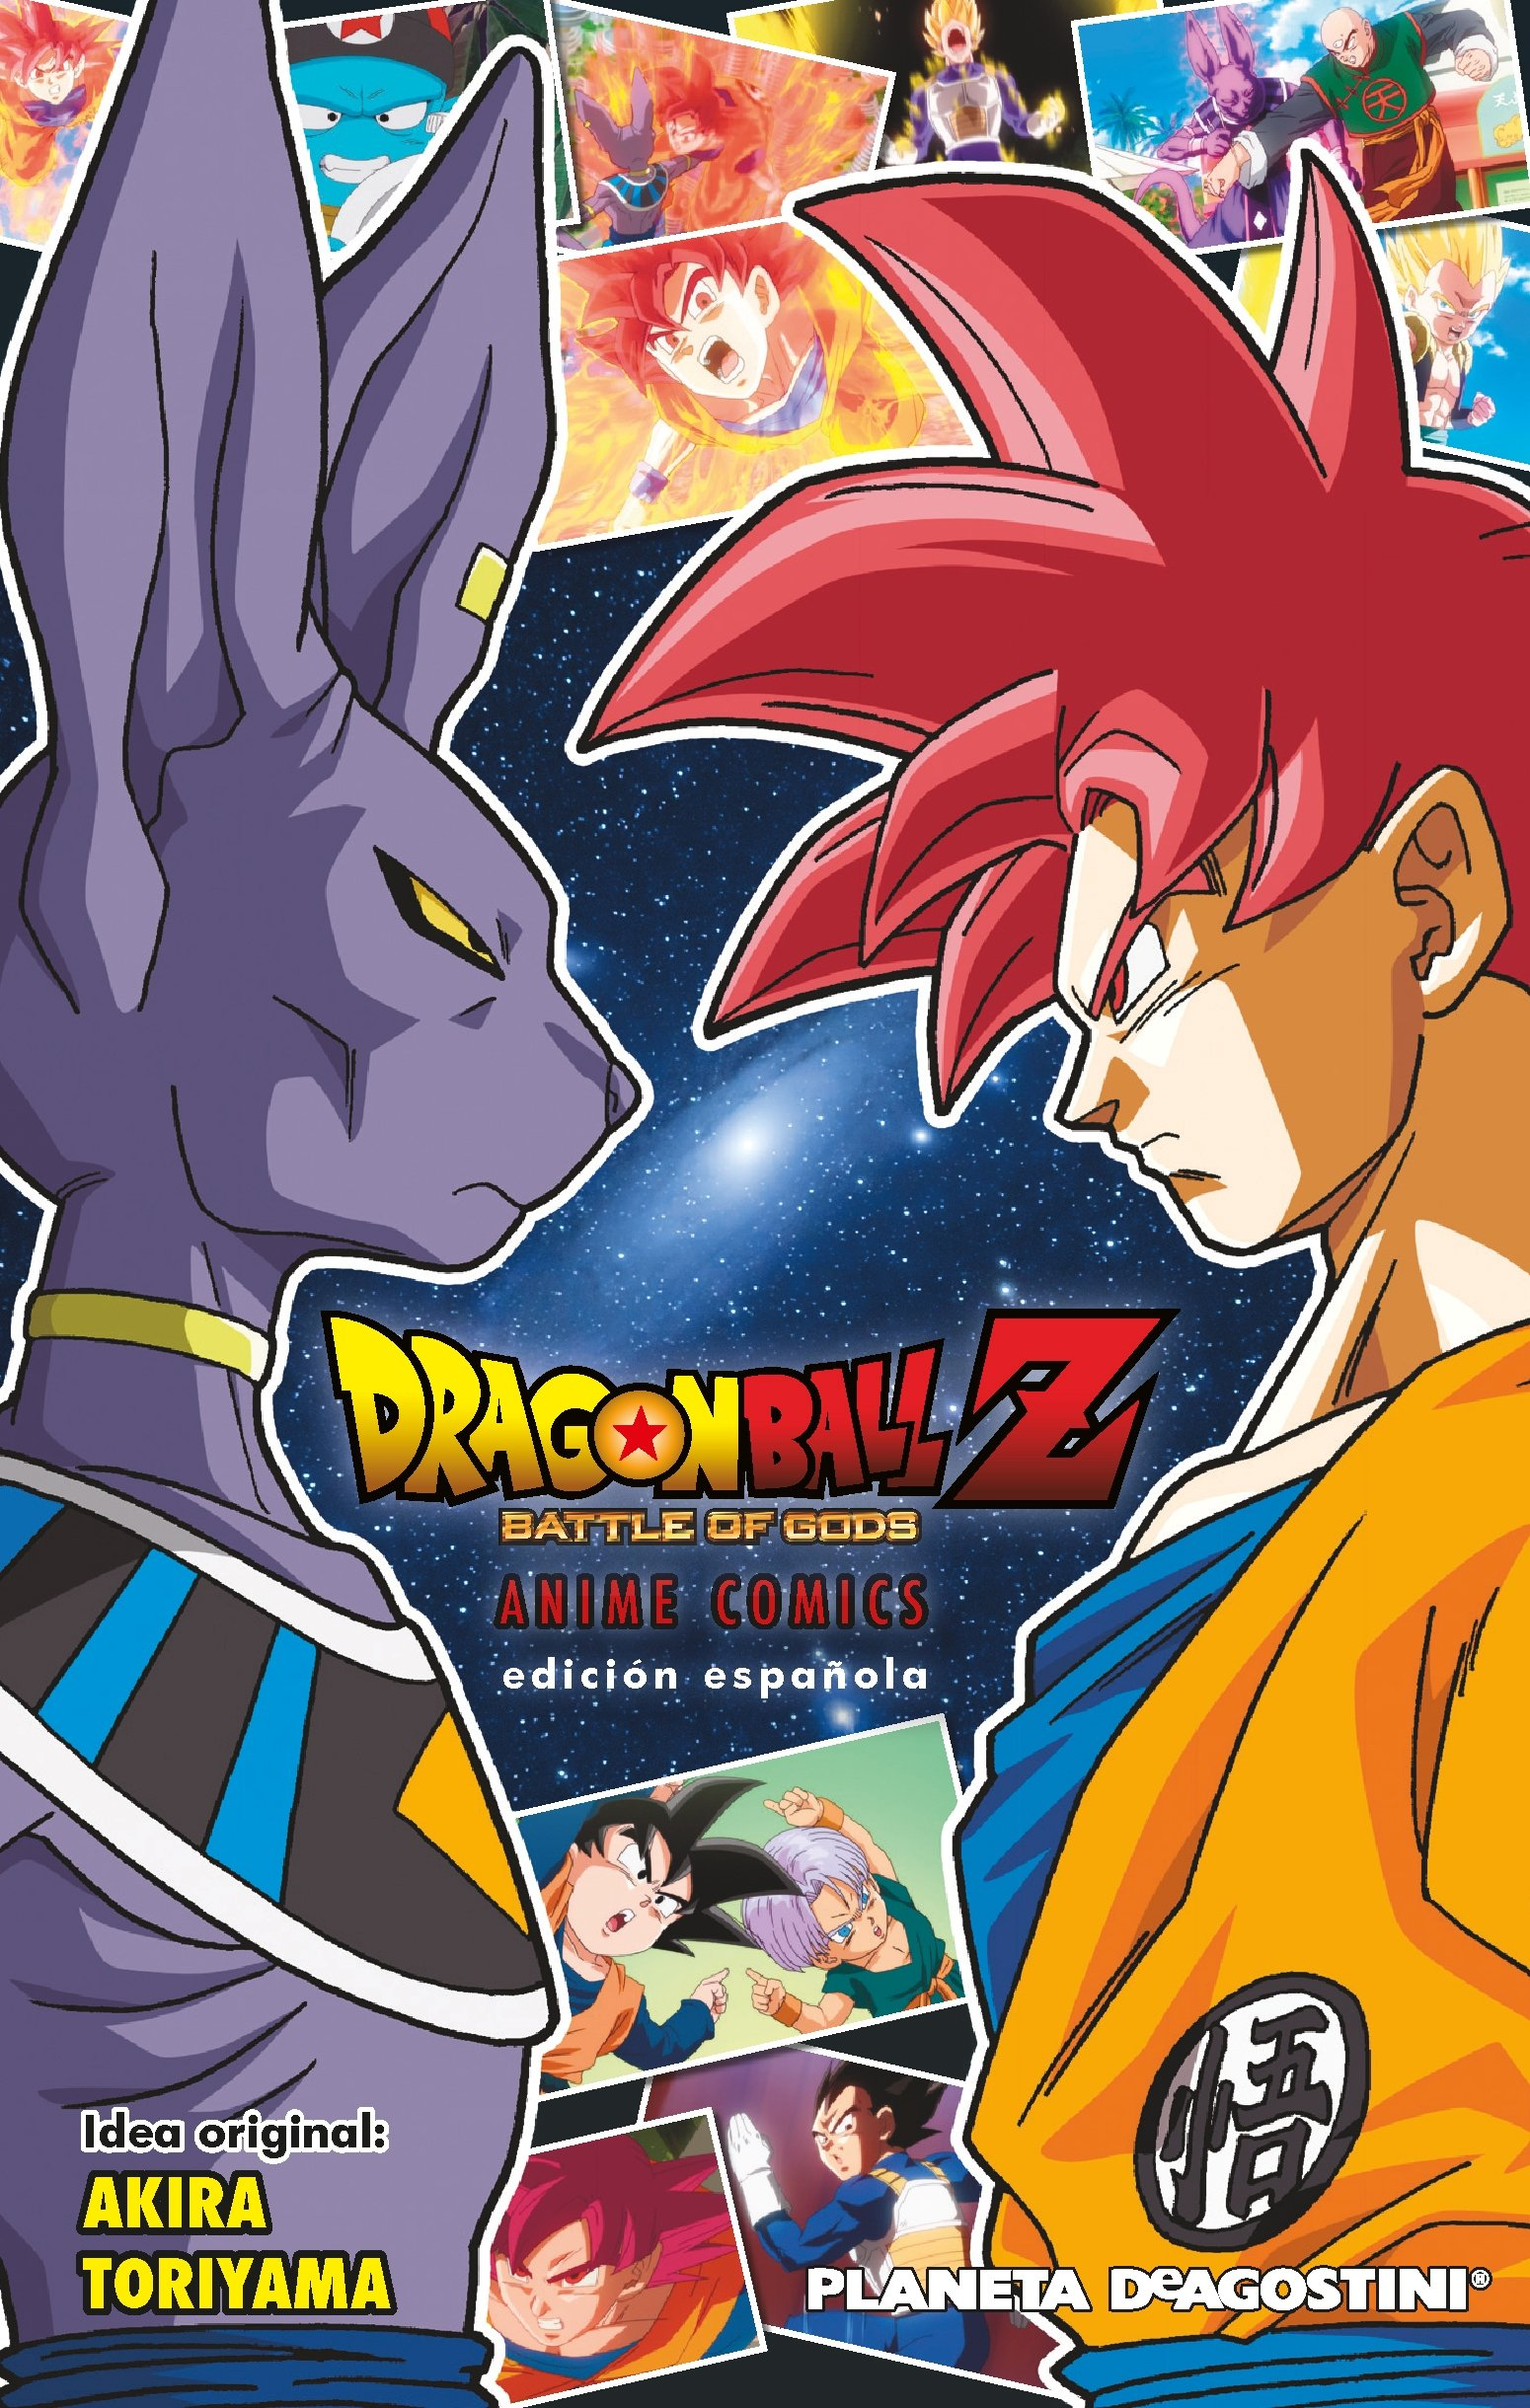 Dragon Ball Z La Batalla De Los Dioses Manga Shonen Spanish Edition Toriyama Akira Daruma 9788416090167 Books